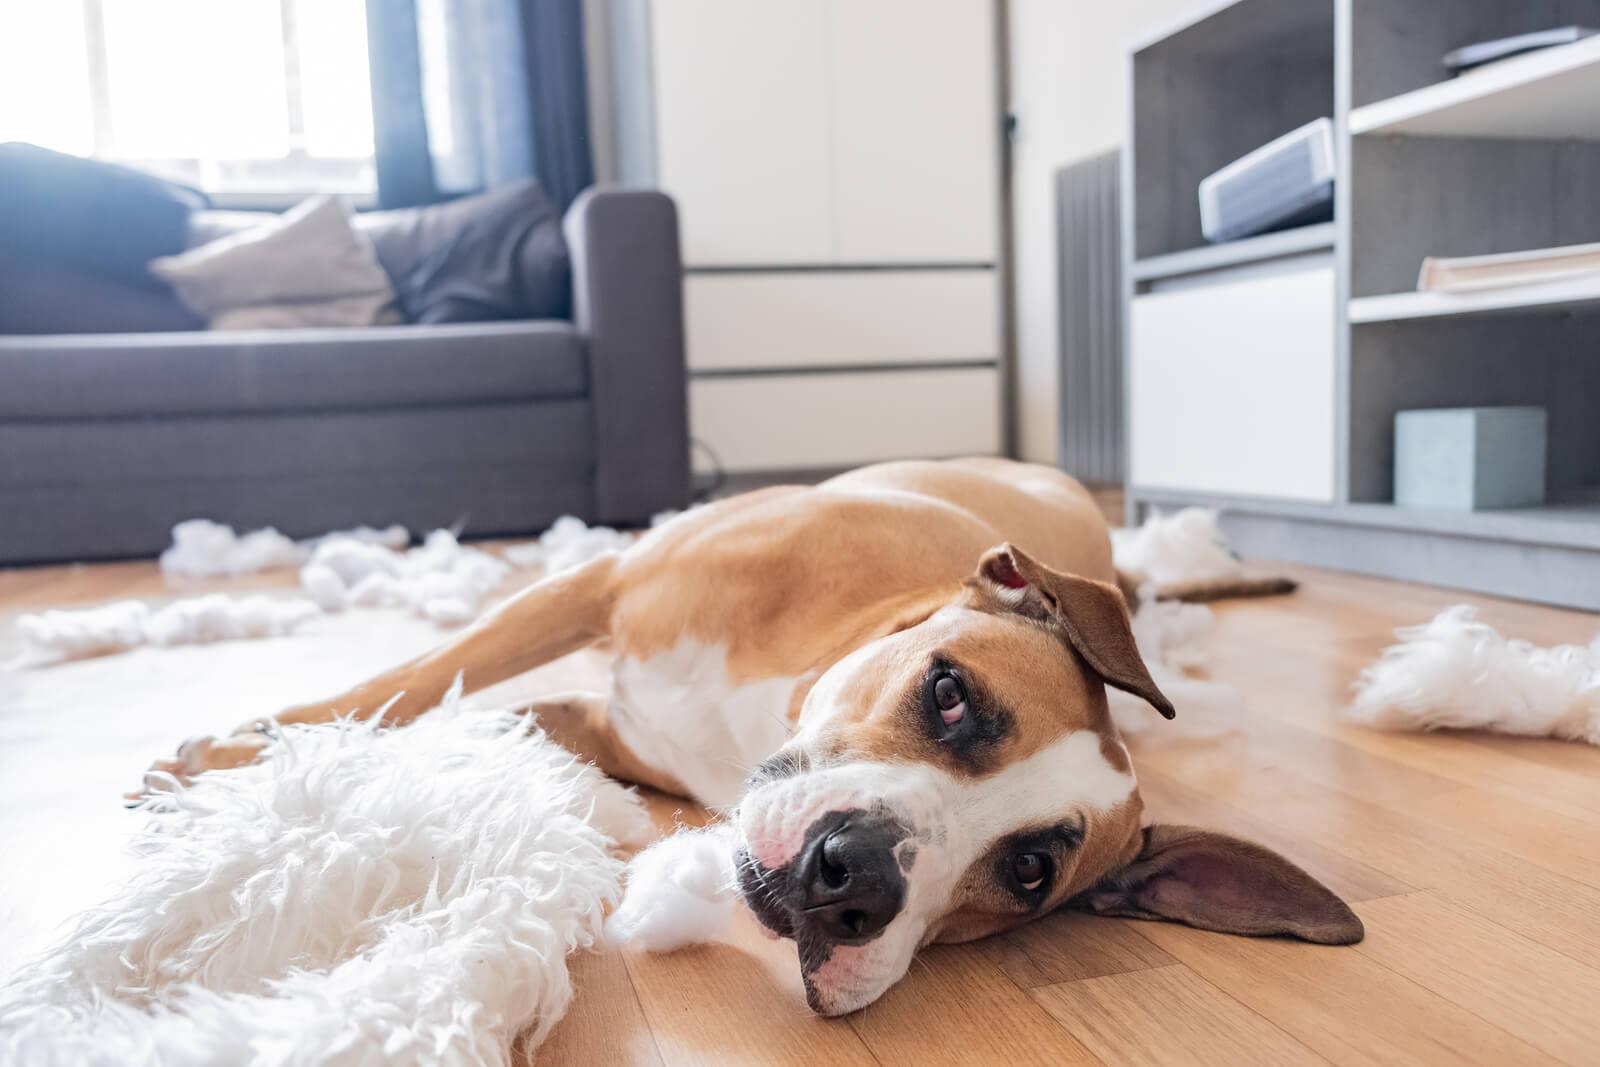 dog looking sad laying on a living room floor